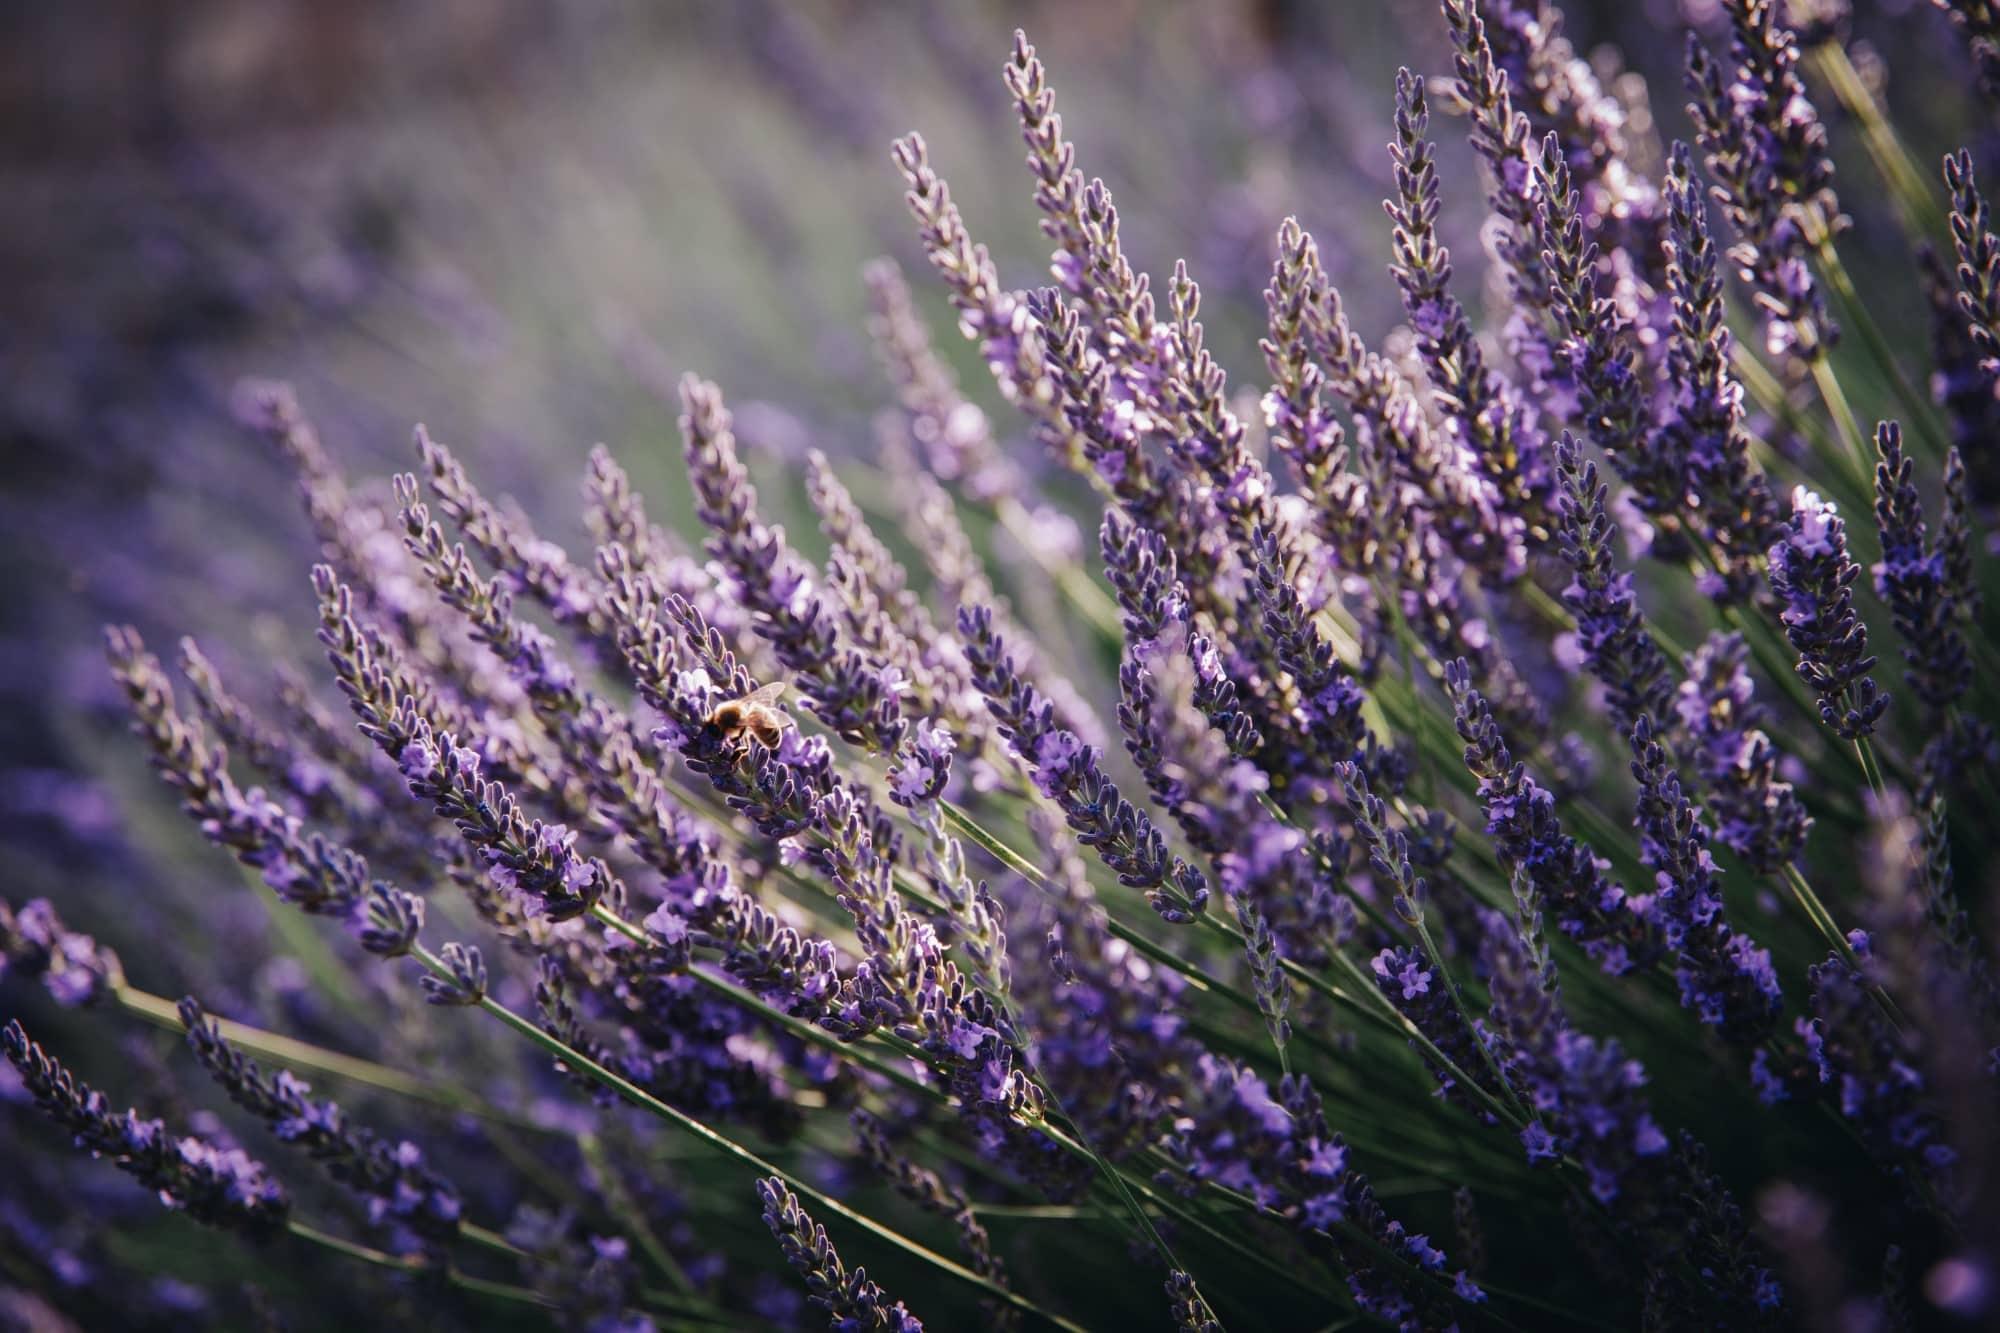 Fine-Art Print: Lavendel